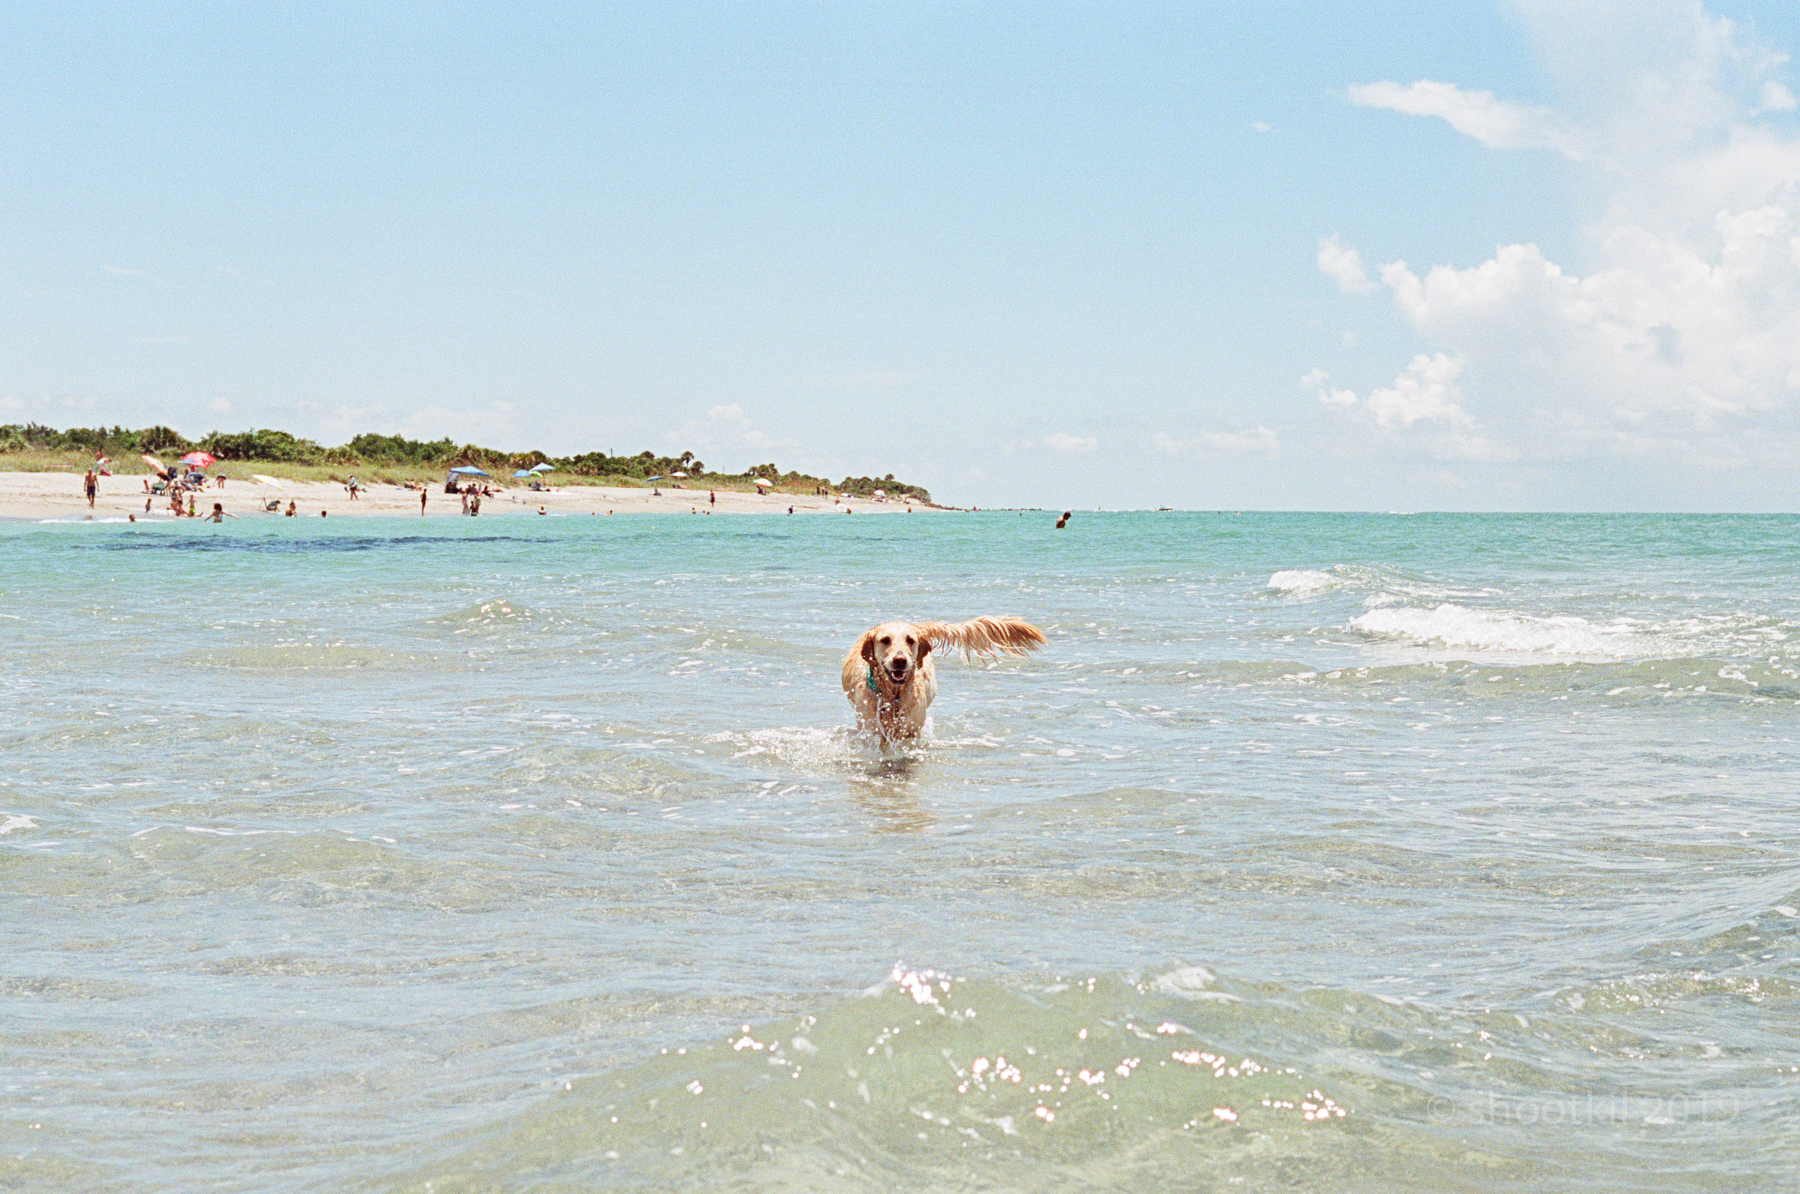 Dog-Beach-Ripley-07272019-15.jpg